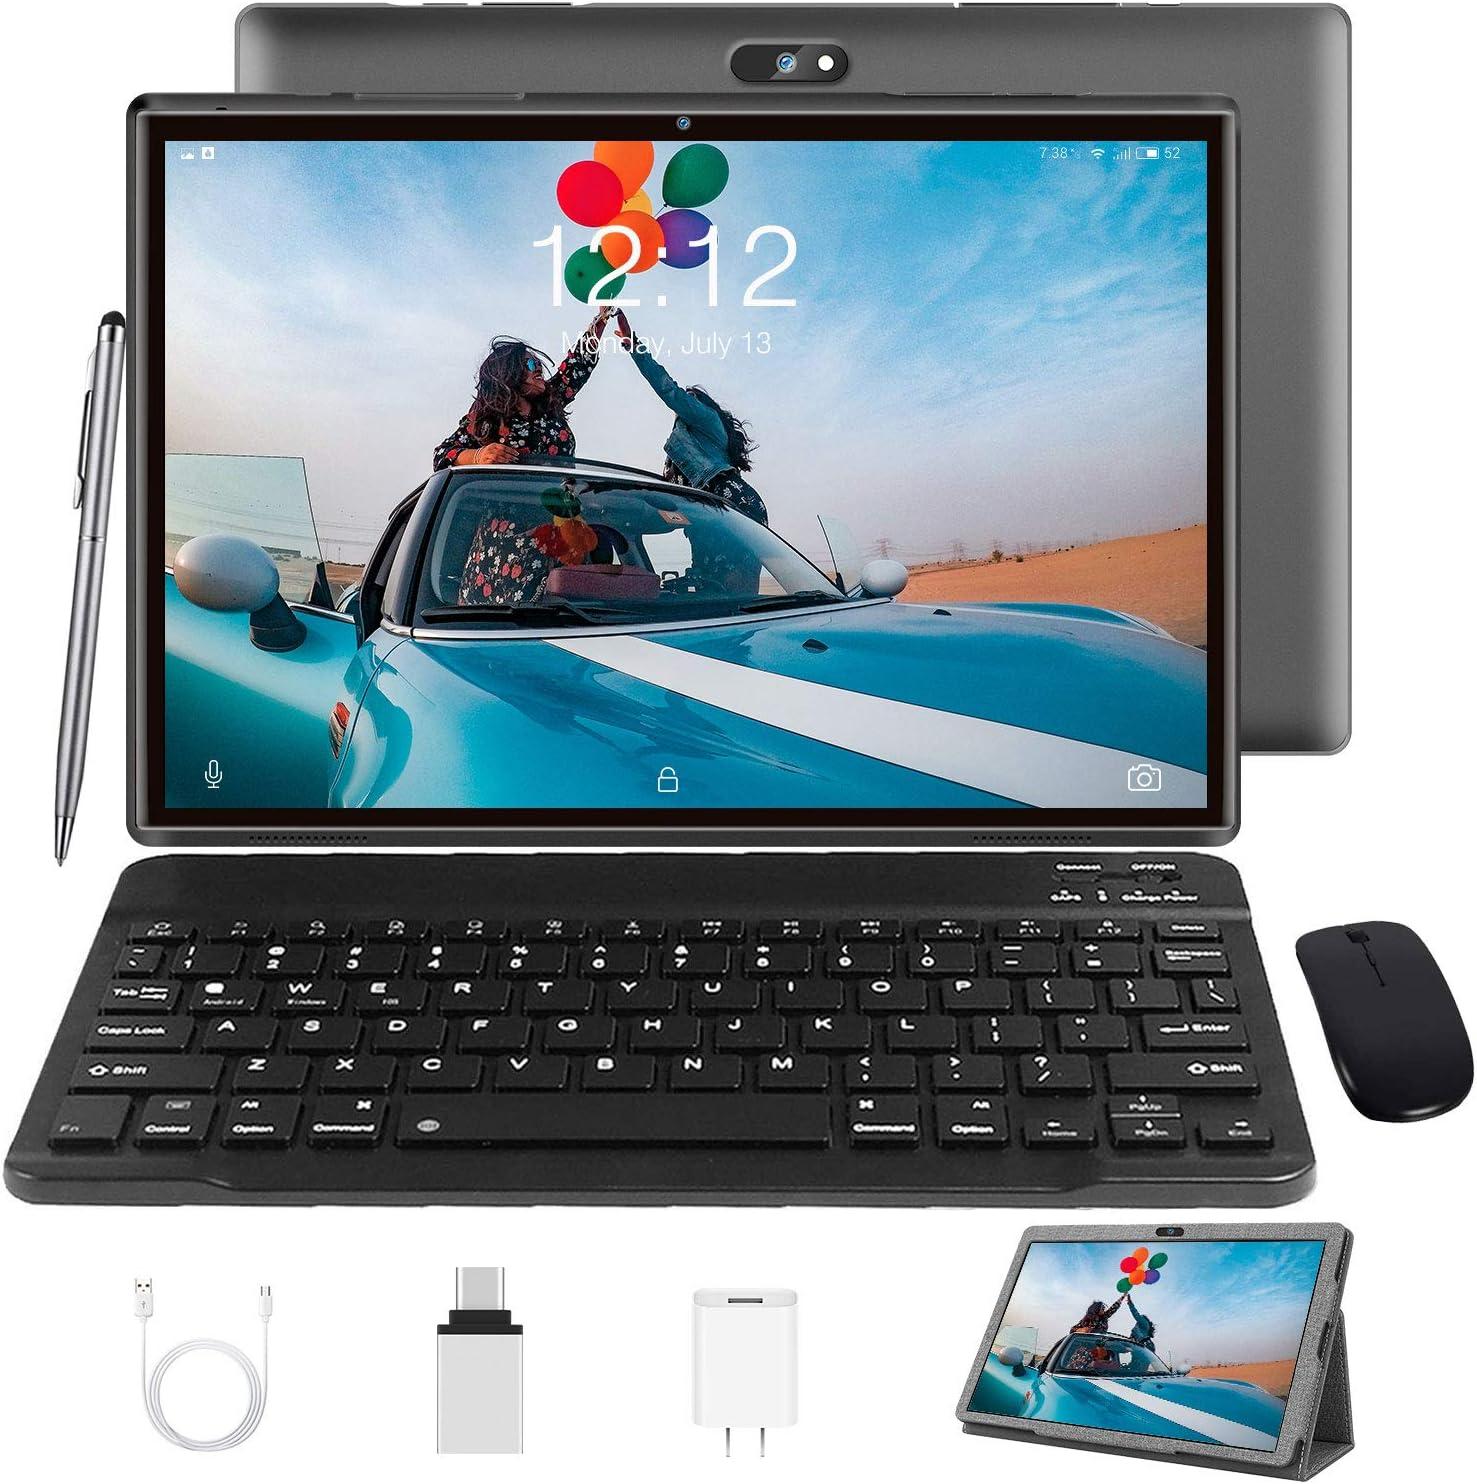 Tablet 10 Zoll Android 10 Tablet Pc Mit Tastatur 4g Lte Computer Zubehör